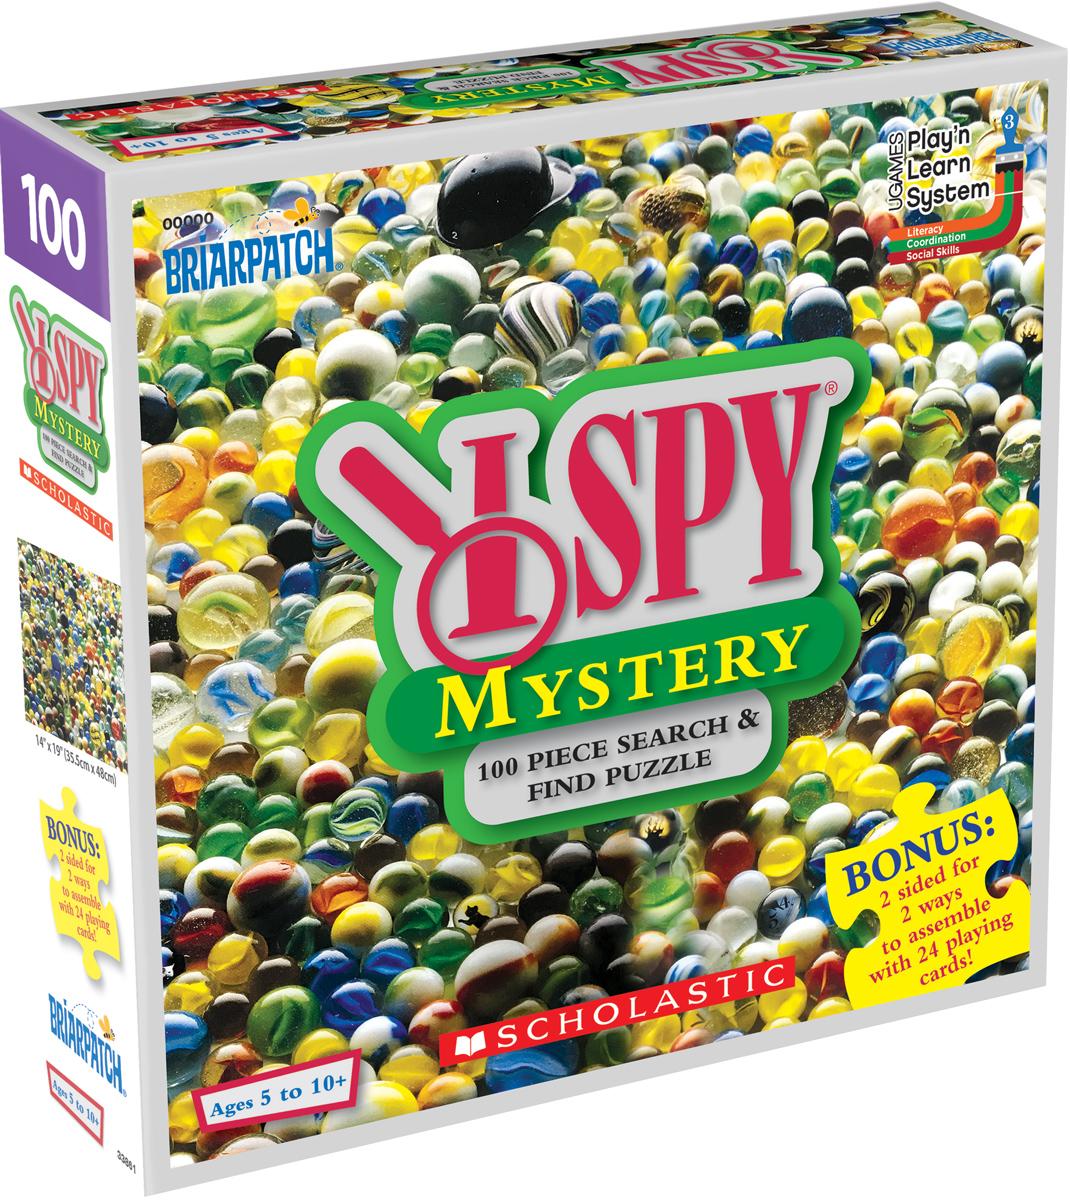 I SPY Mystery Educational Hidden Images